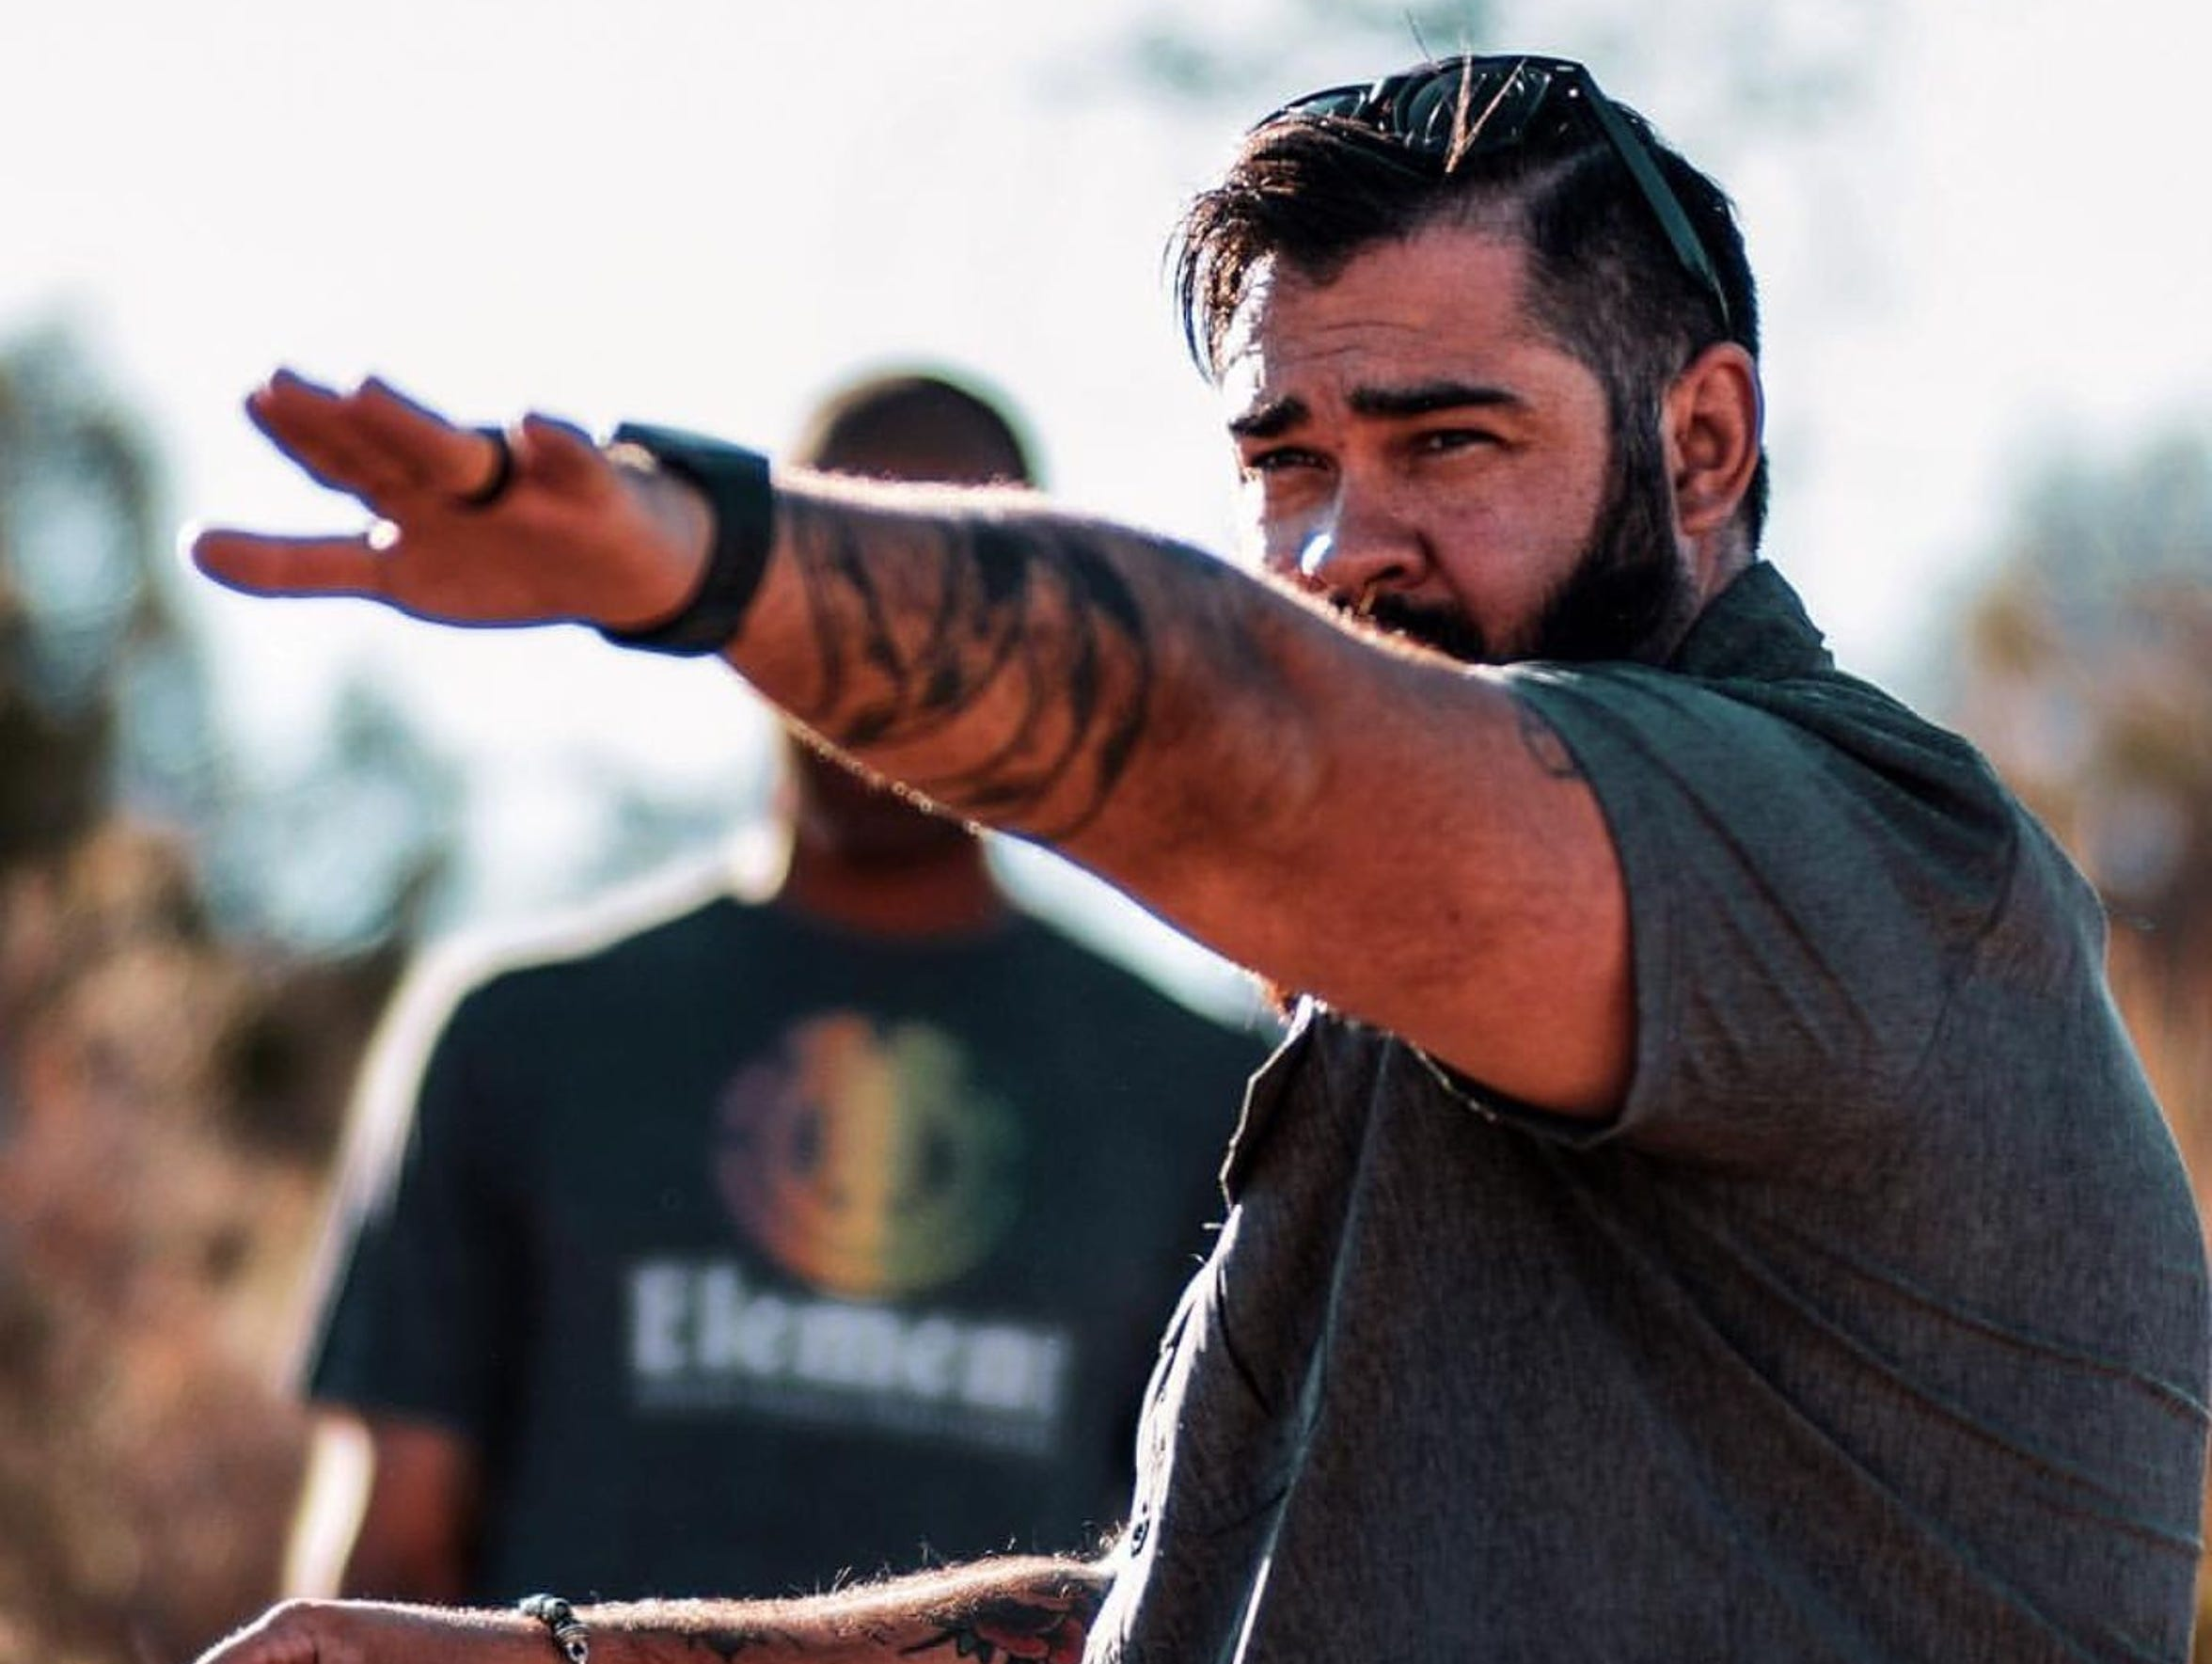 Local filmmaker Brent Garcia is organizing a film festival